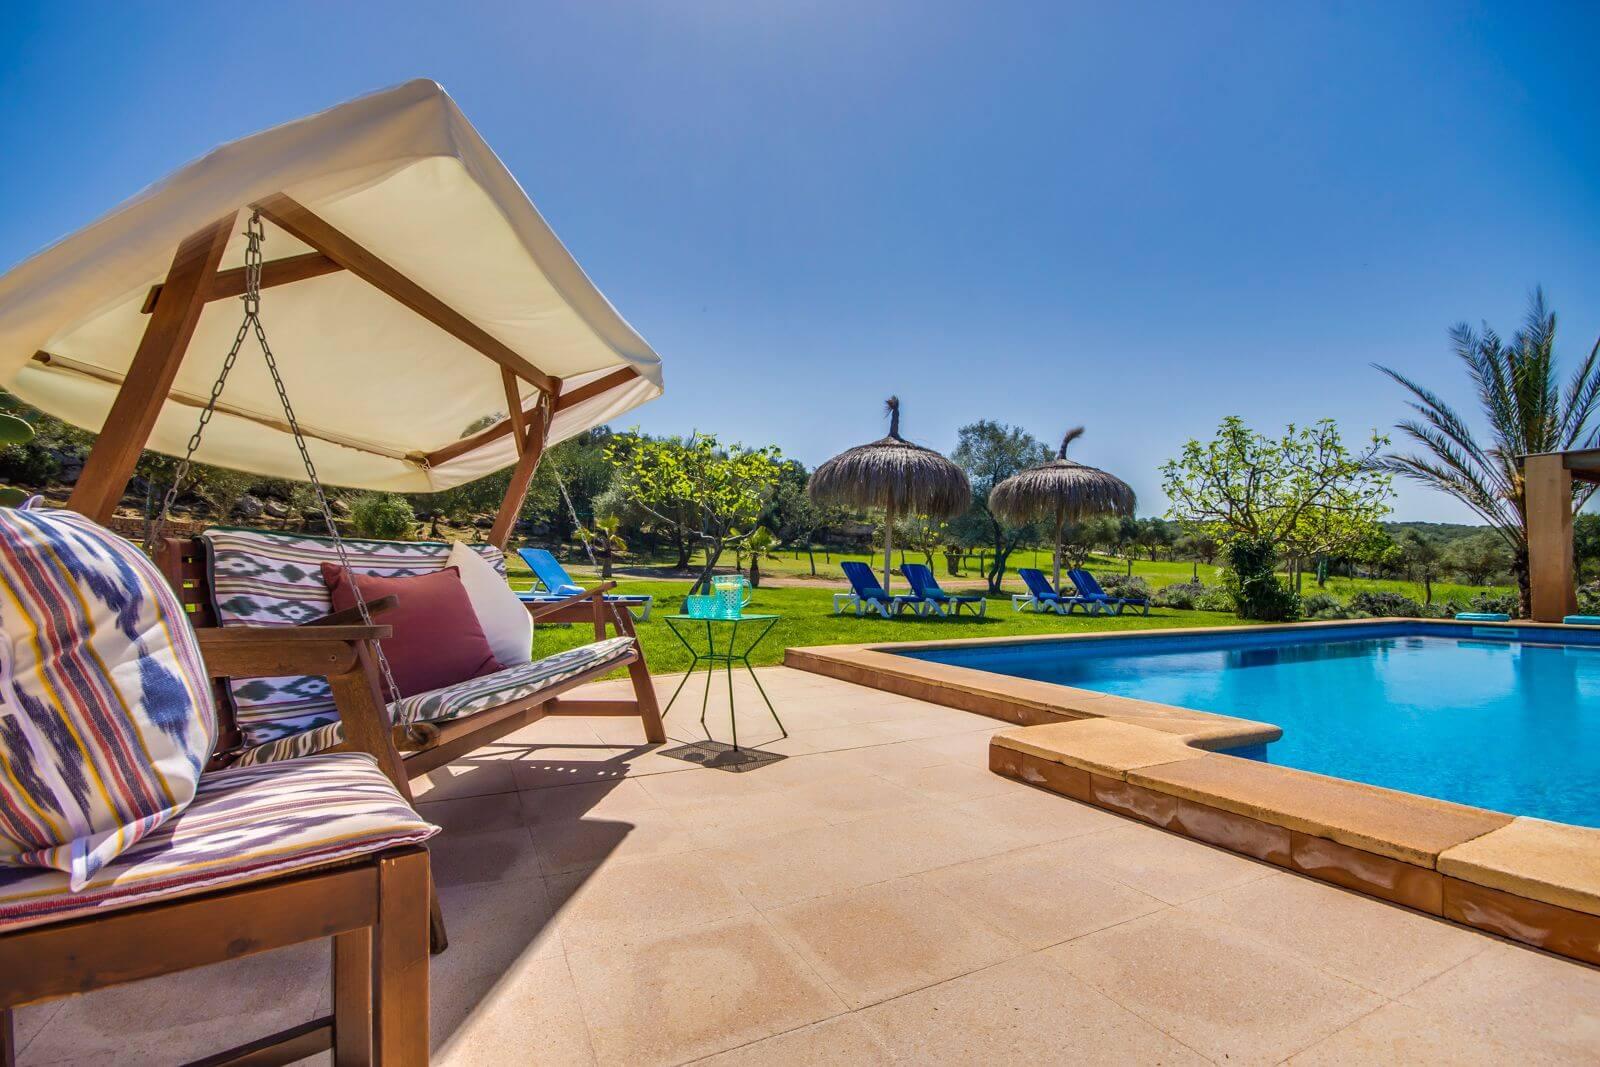 Mallorca Finca Toni - Hollywoodschaukel zum Entspannen